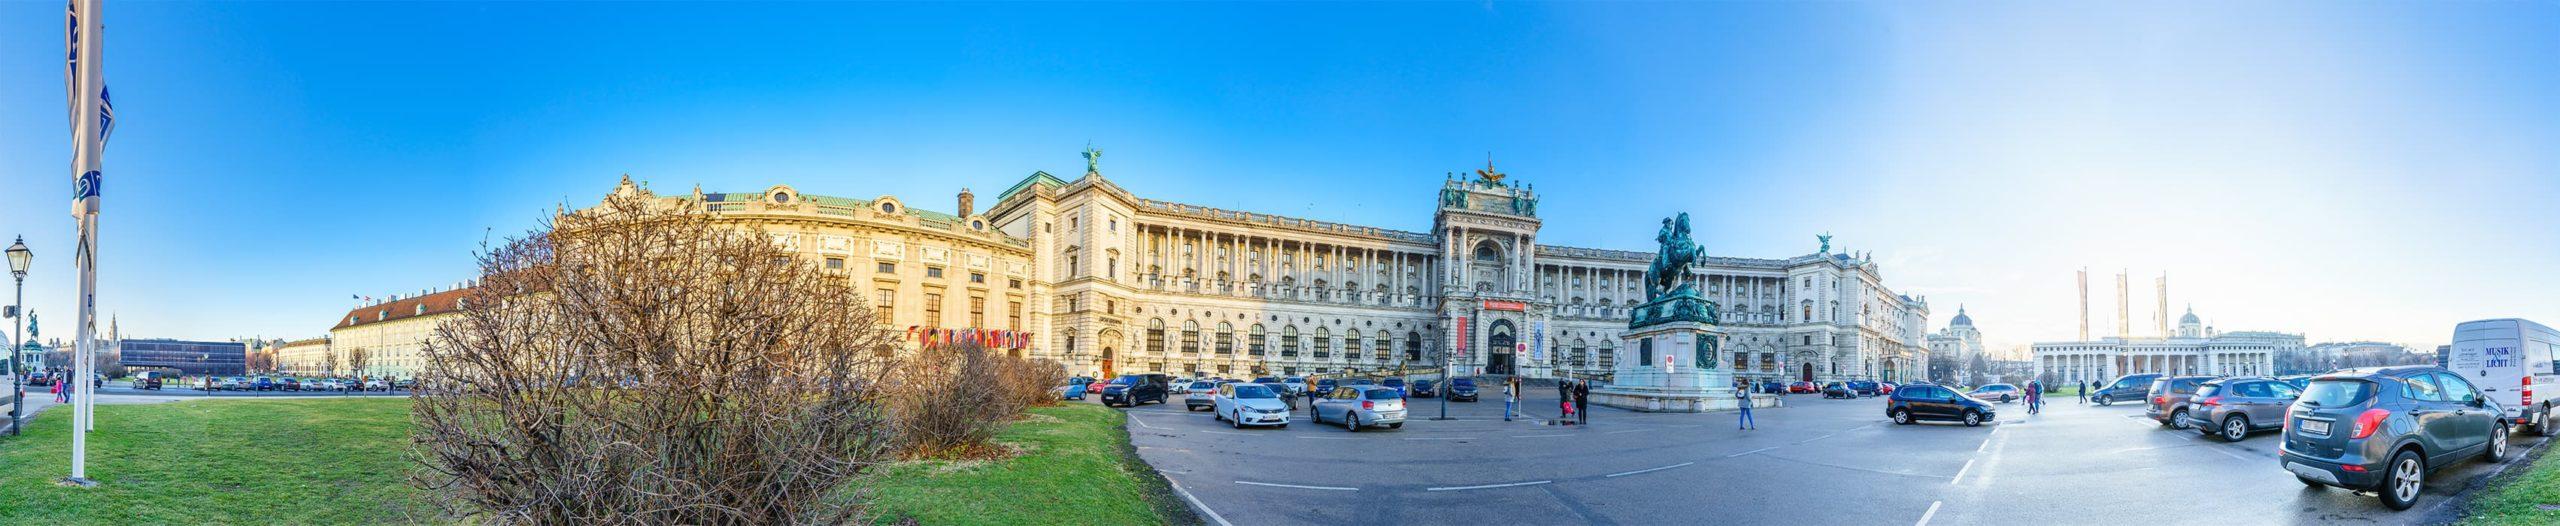 wien-panorama-hofburg